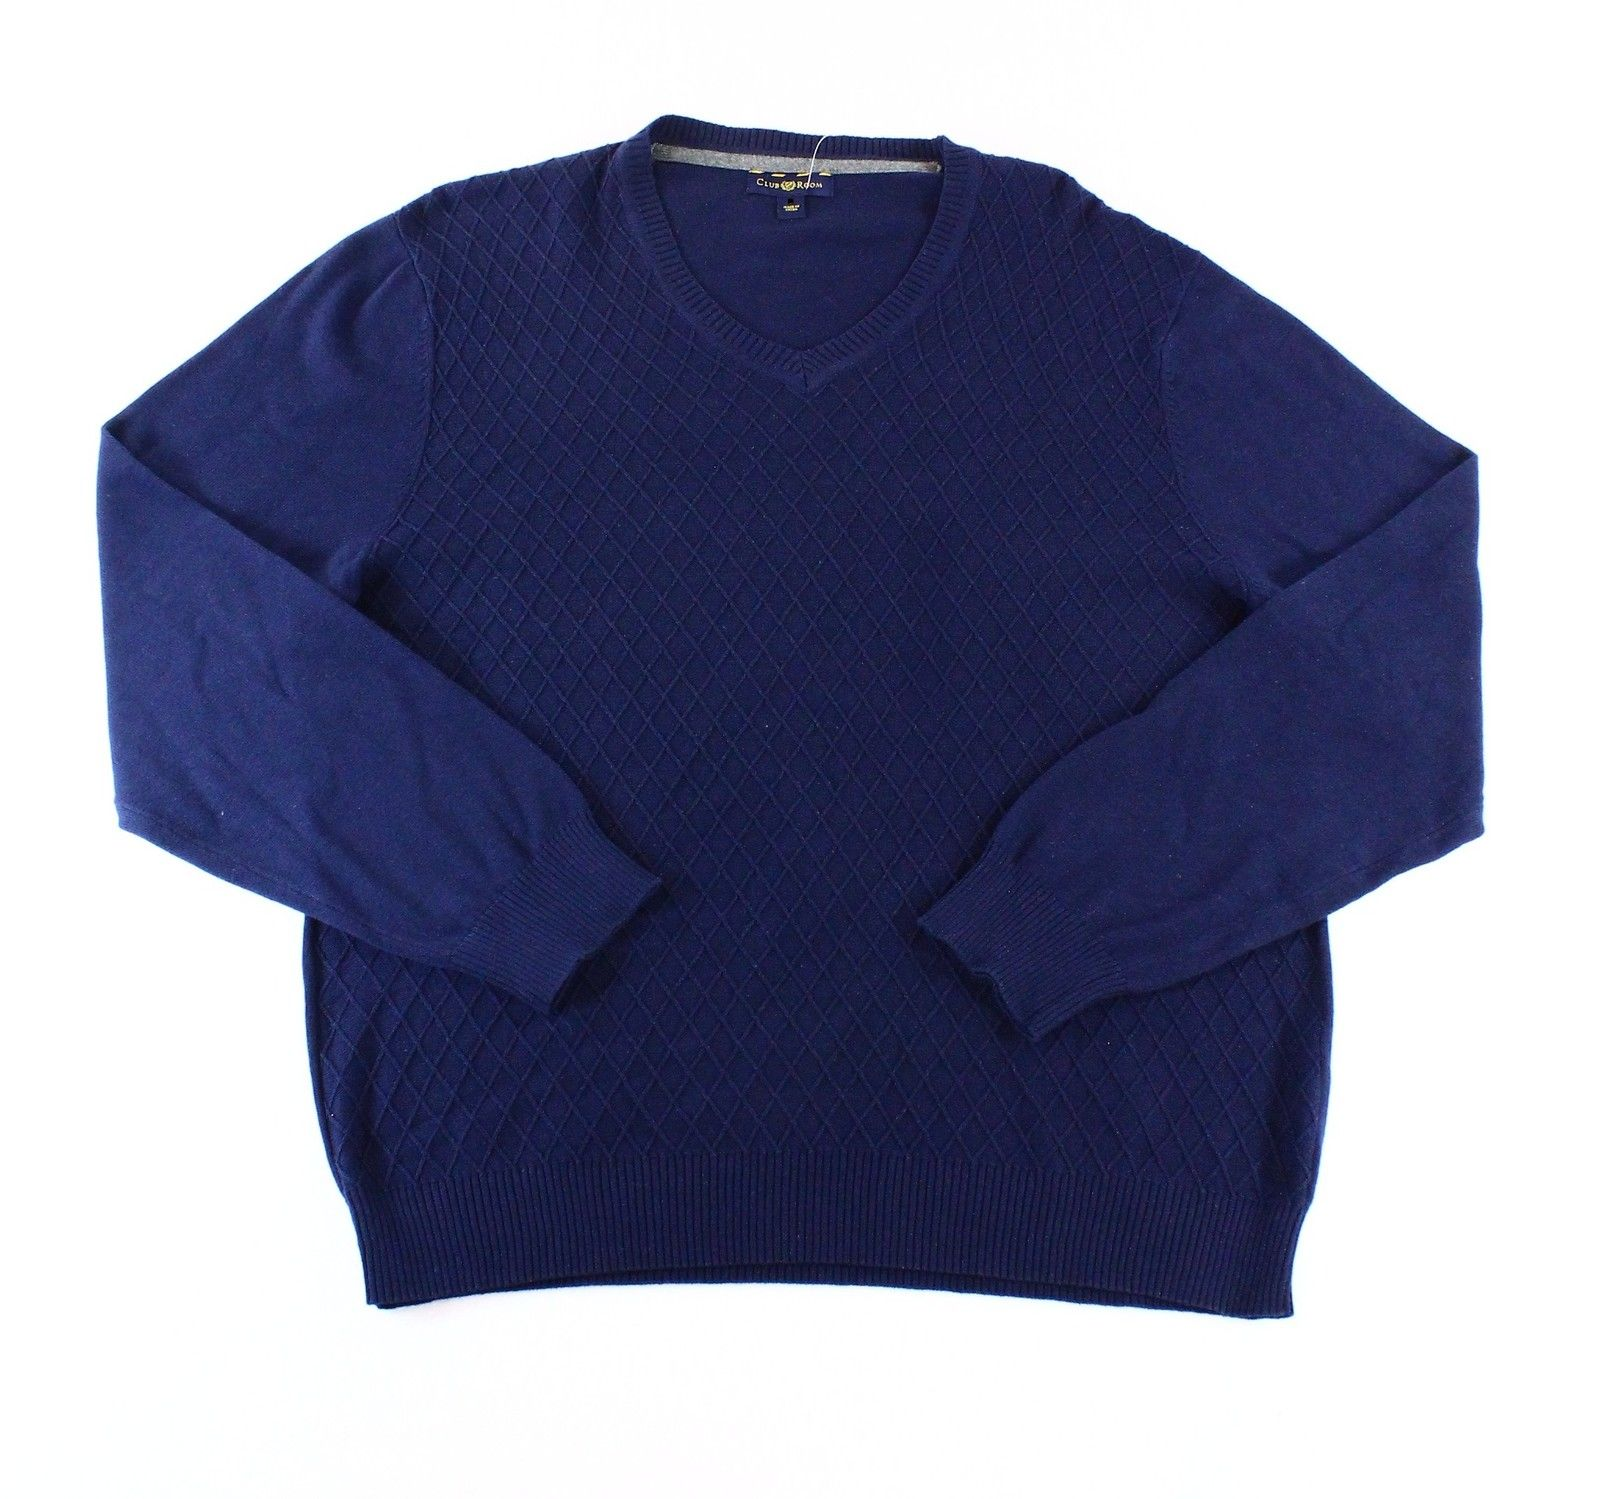 Club Room NEW Navy Blue Mens Size 2XL Argyle Knit V-Neck Sweater